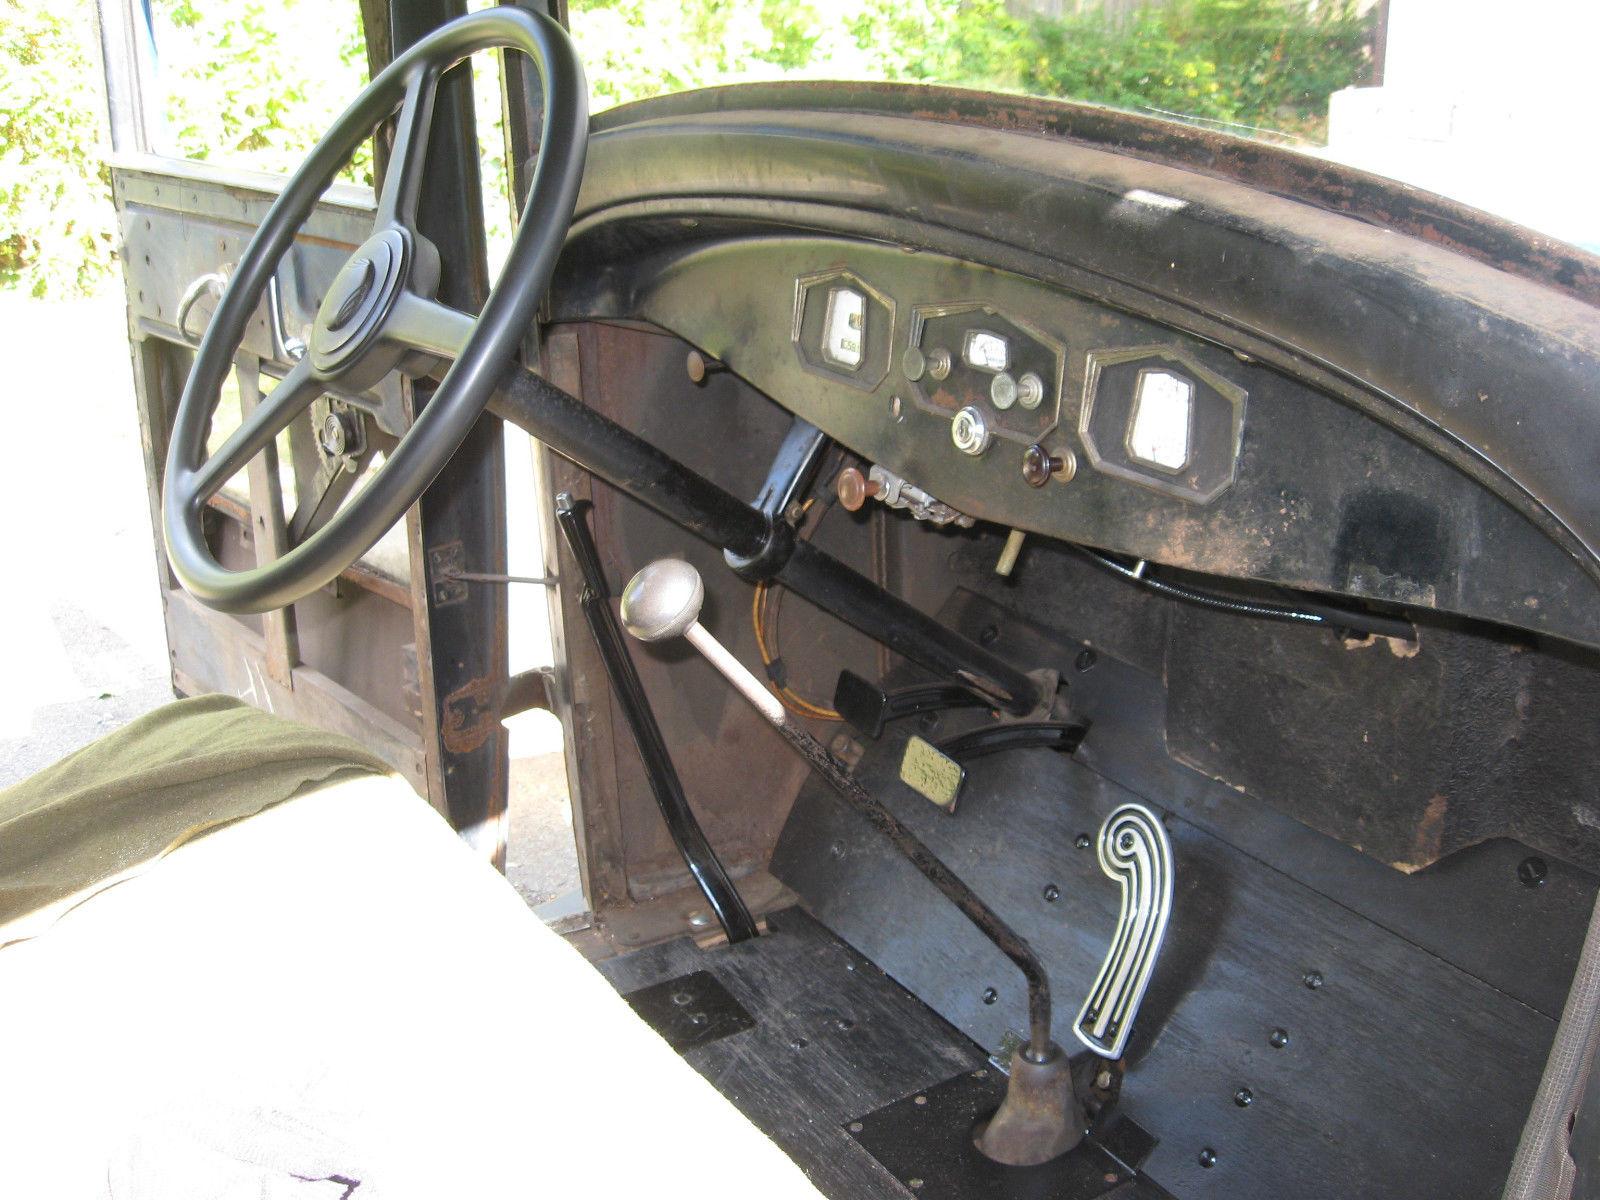 1930 Hupmobile Six Model S Sedan Unrestored Driving Barn Car Chevy Spare Tire Mount